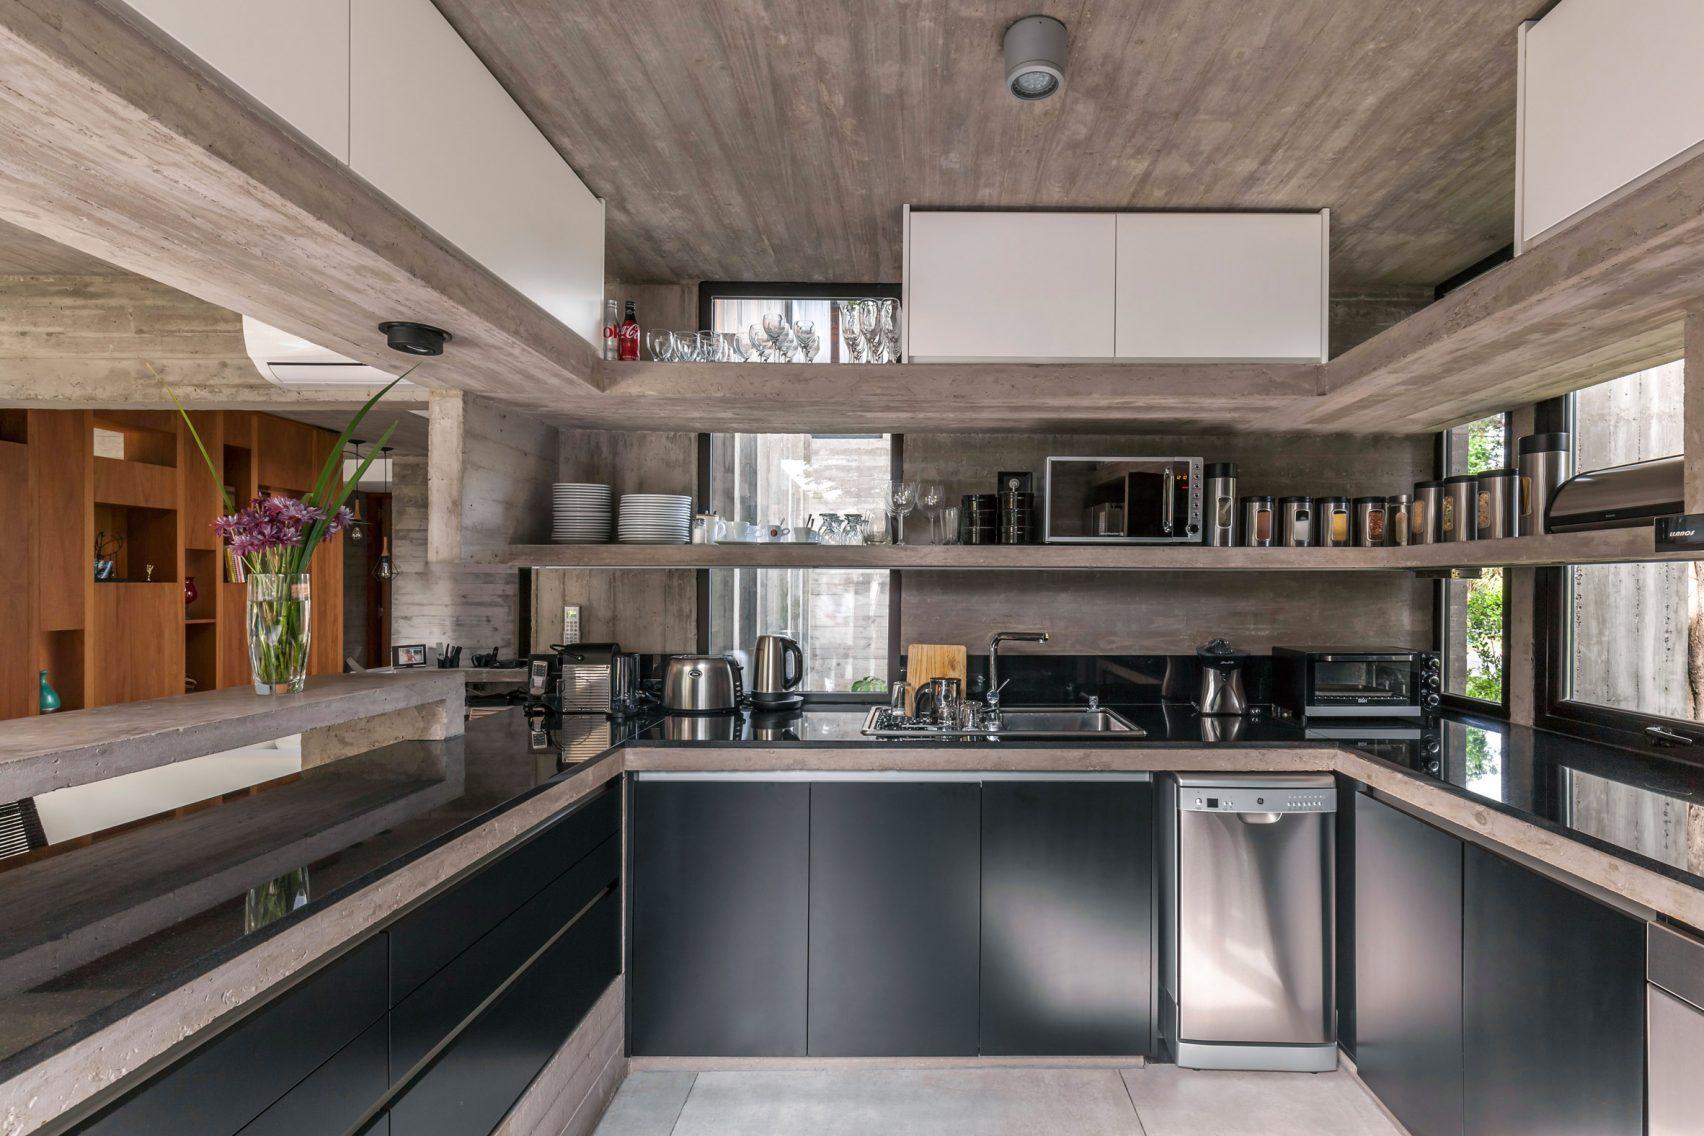 casa-aranzazu-besonias-almeida-arquitectos-architecture-residential-buenos-aires-argentina_dezeen_2364_col_12-1704x1136.jpg